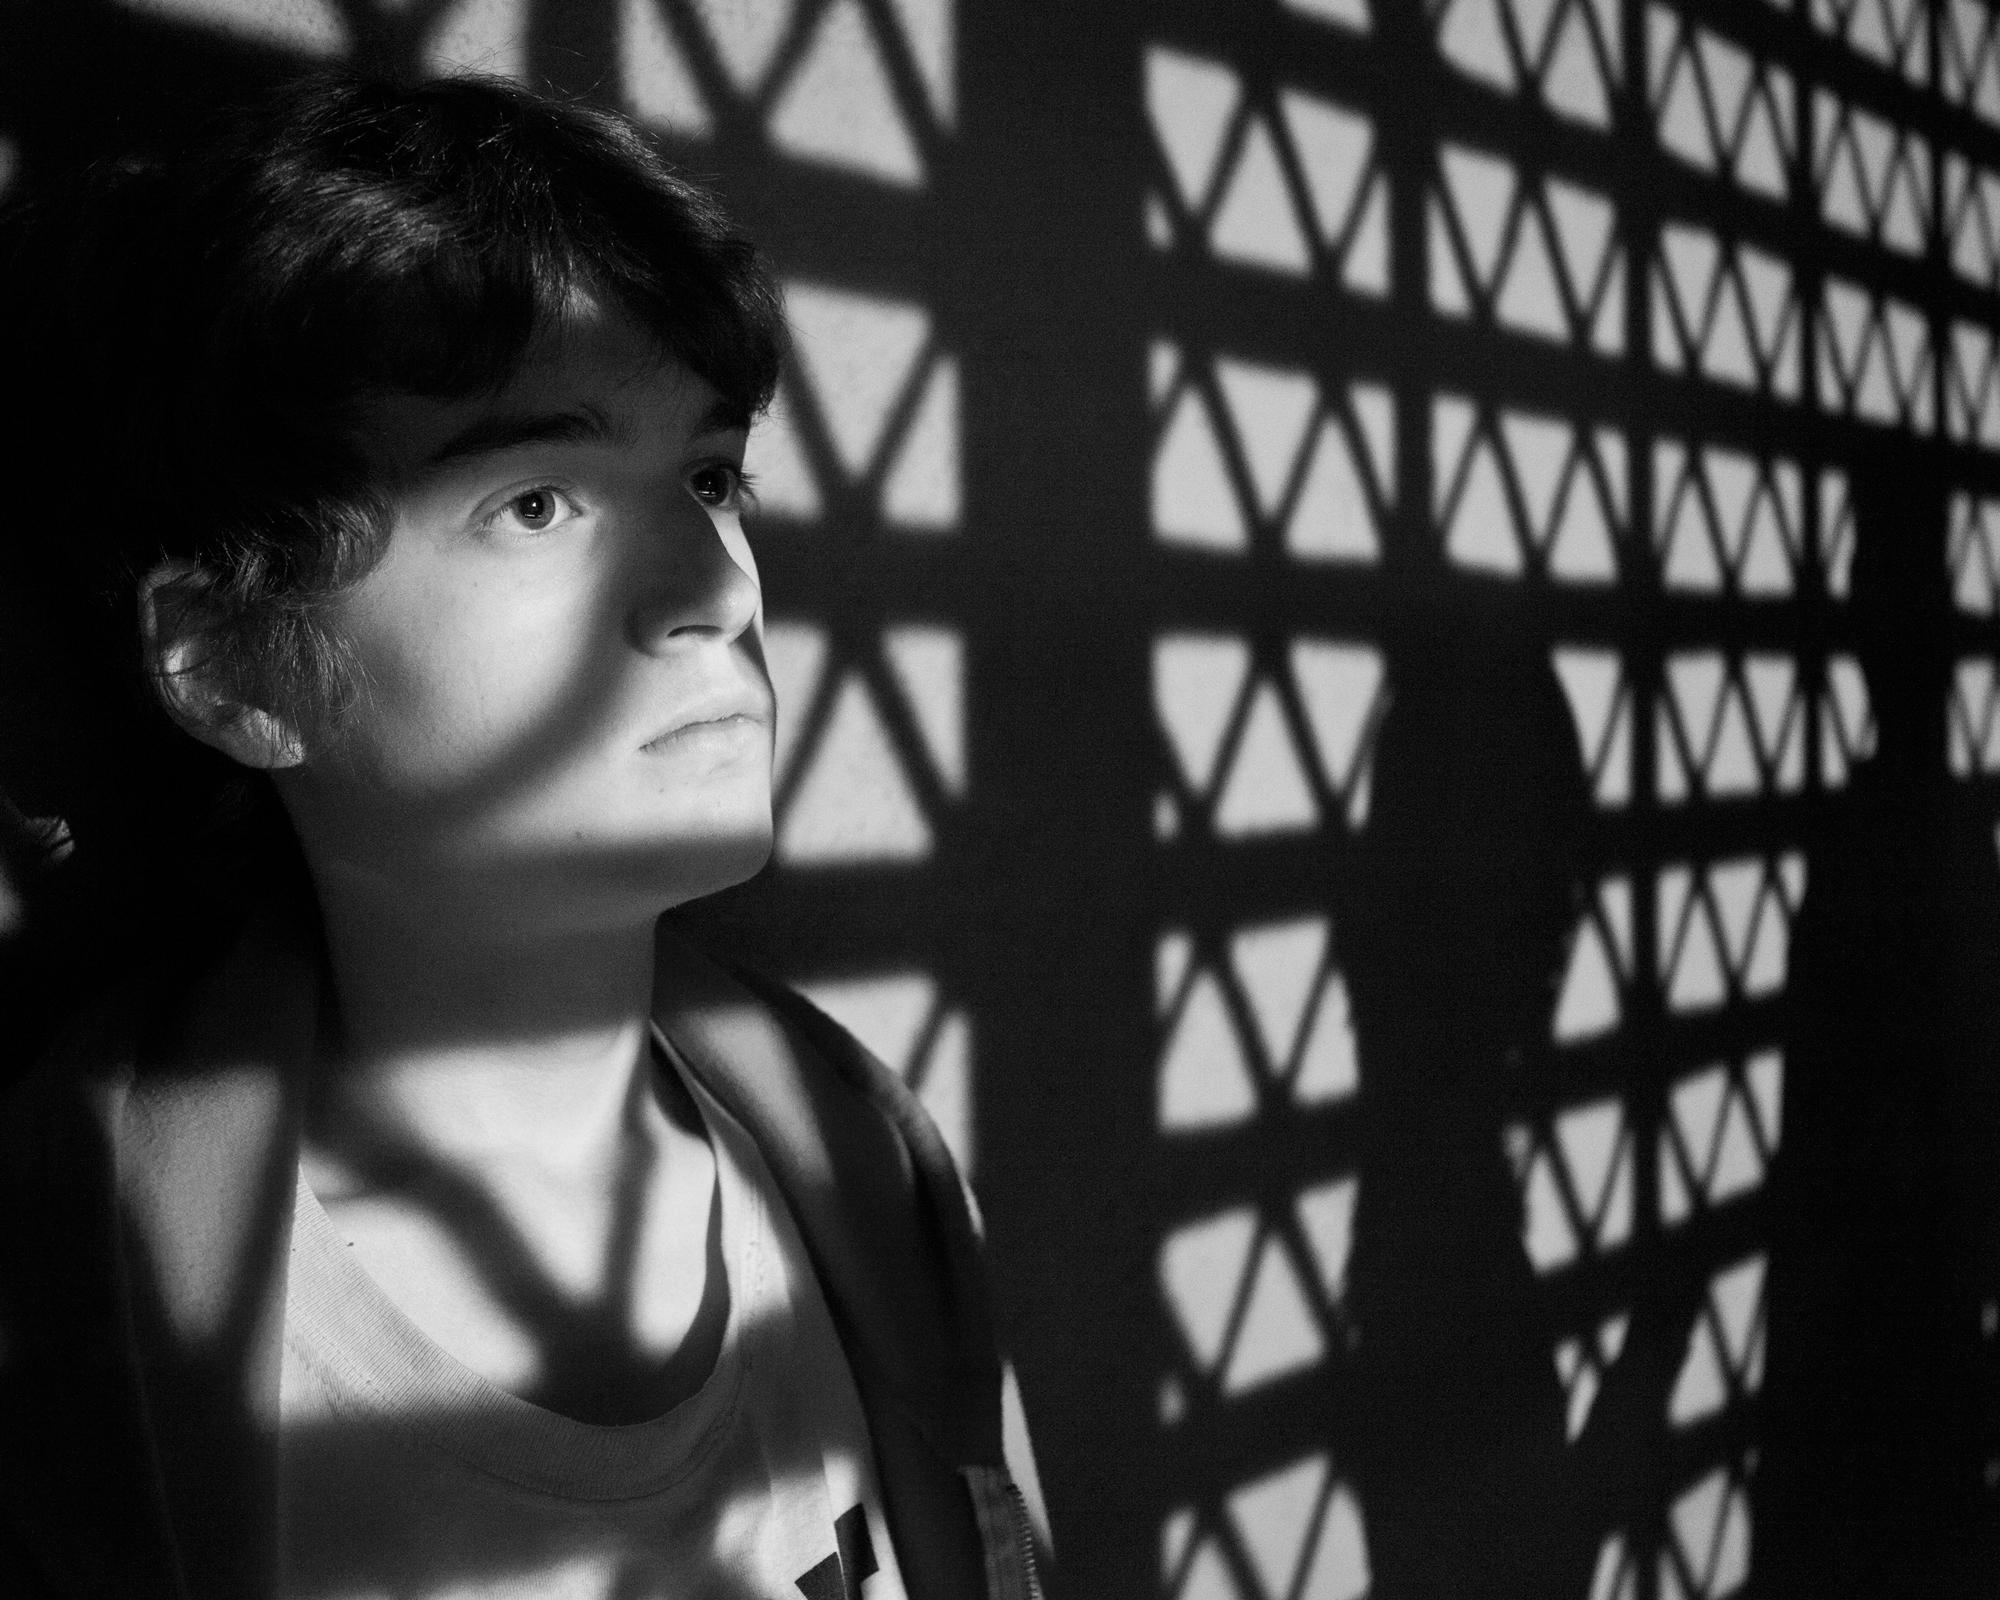 Fotograma de la película Güeros